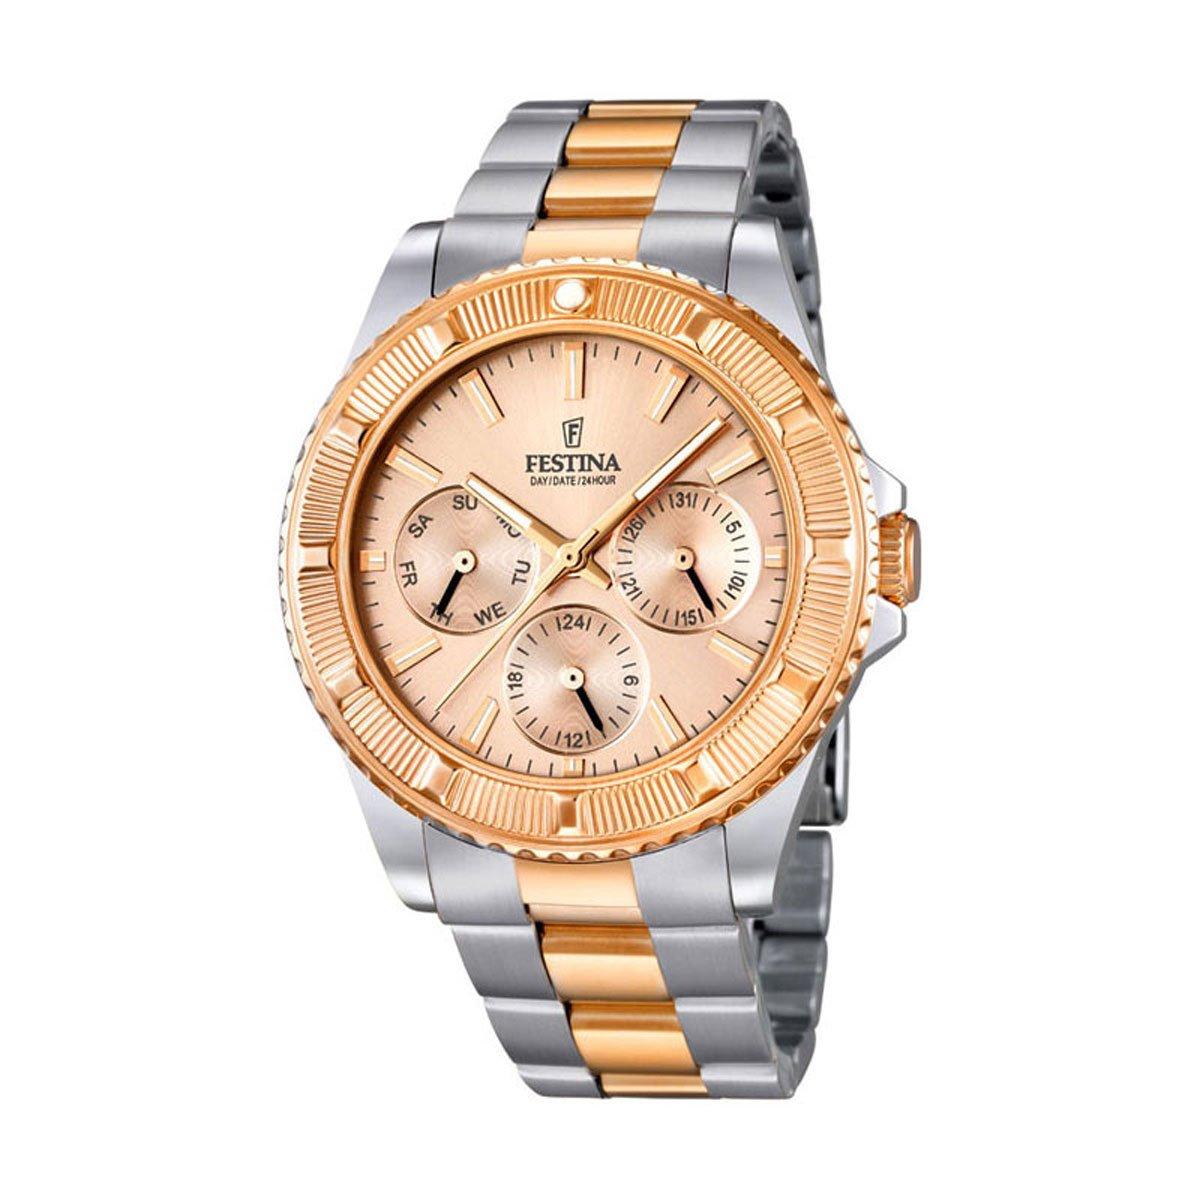 Festina Vendome F16692/2 - Reloj analógico de cuarzo para mujer, correa de acero inoxidable chapado (agujas luminiscentes): Festina: Amazon.es: Relojes